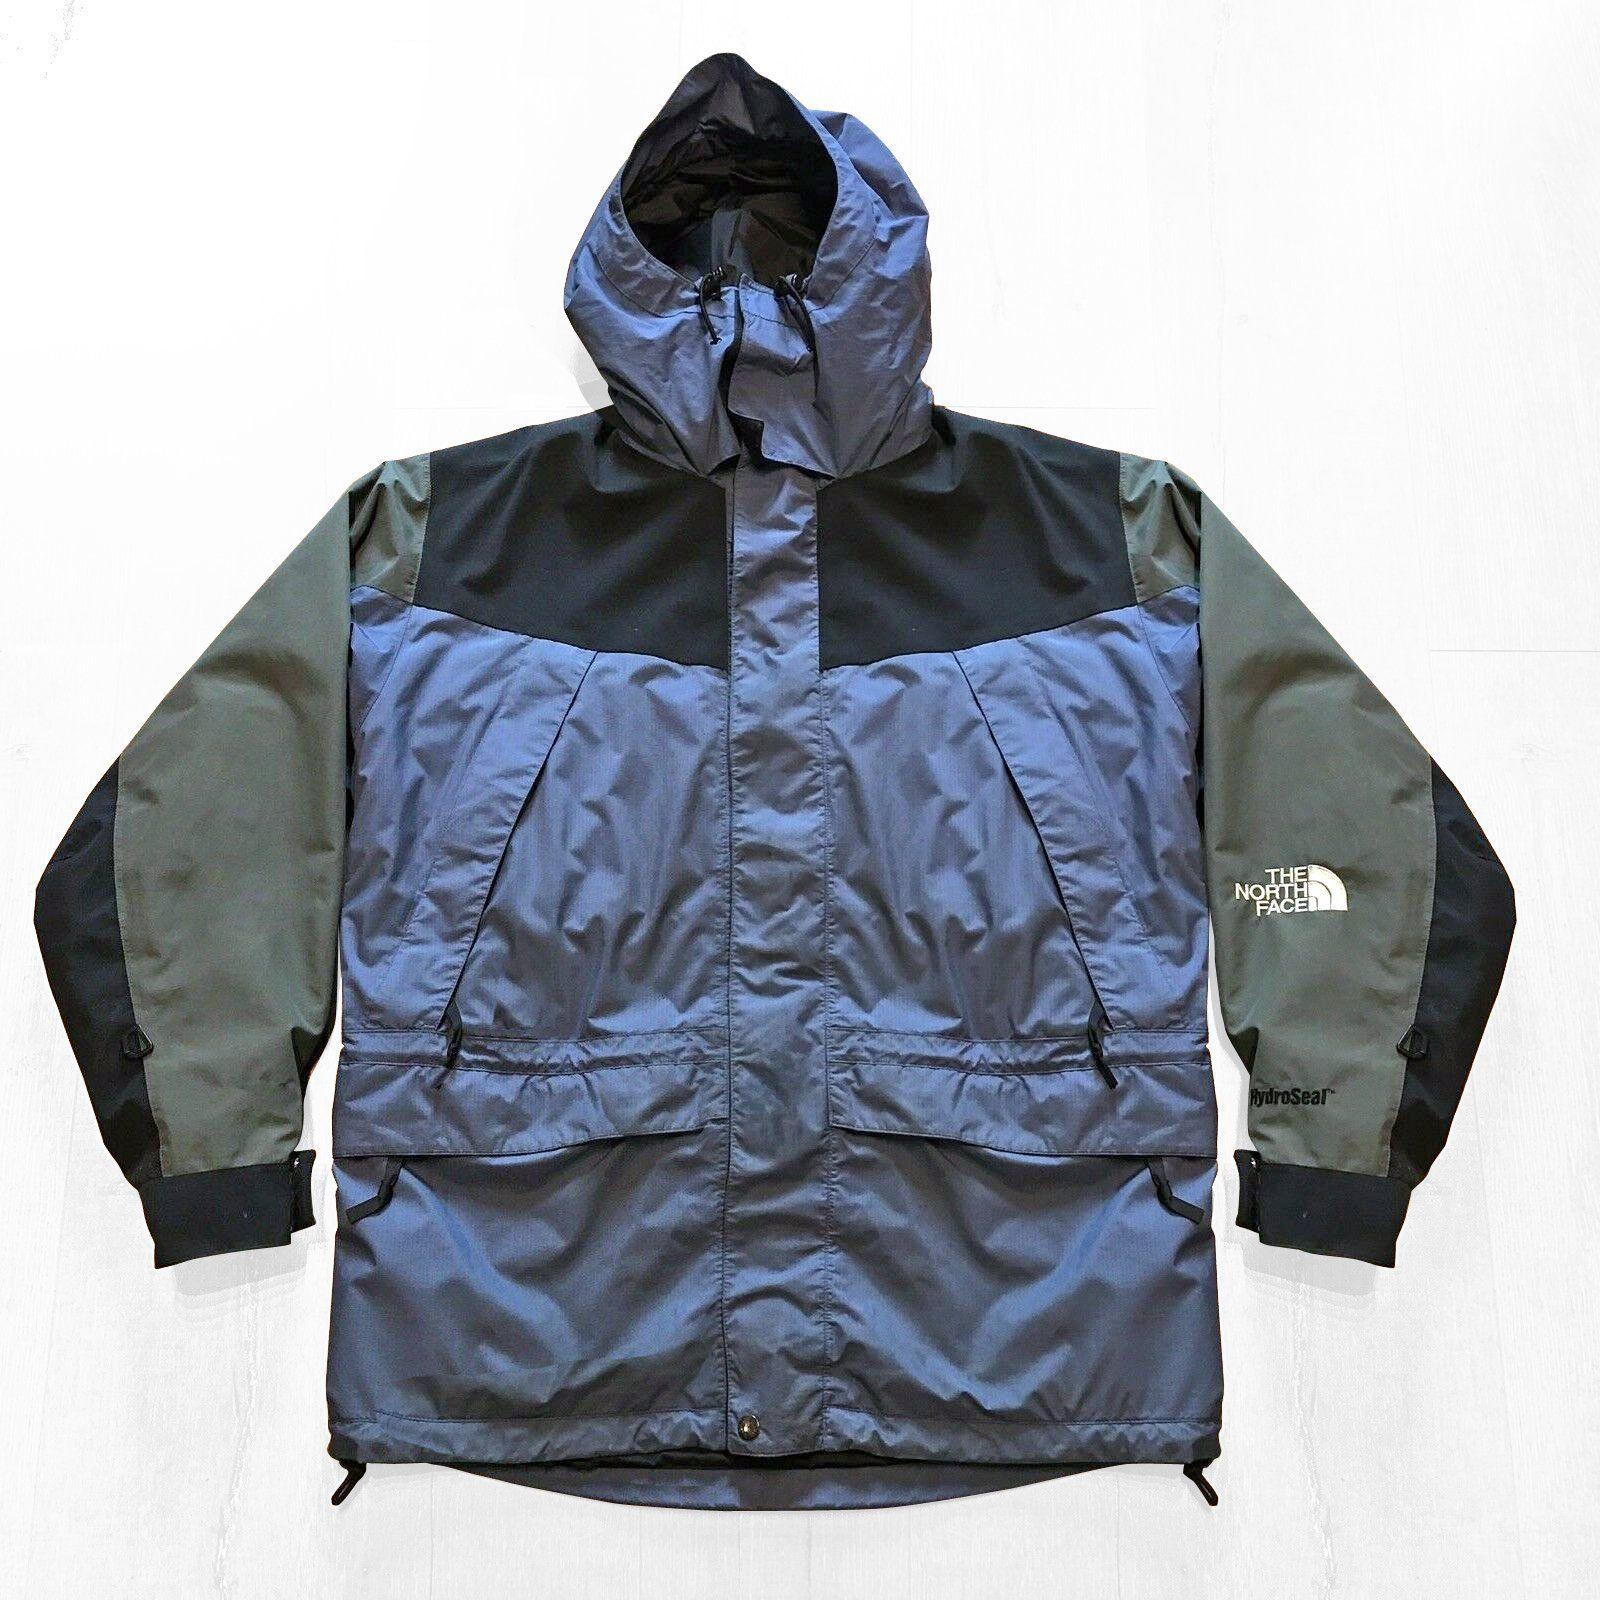 Vintage North Face Goretex Mountain Parka Jacket Size Xl Dark Blue And Beige Parka Jacket The North Face Parka [ 1600 x 1600 Pixel ]